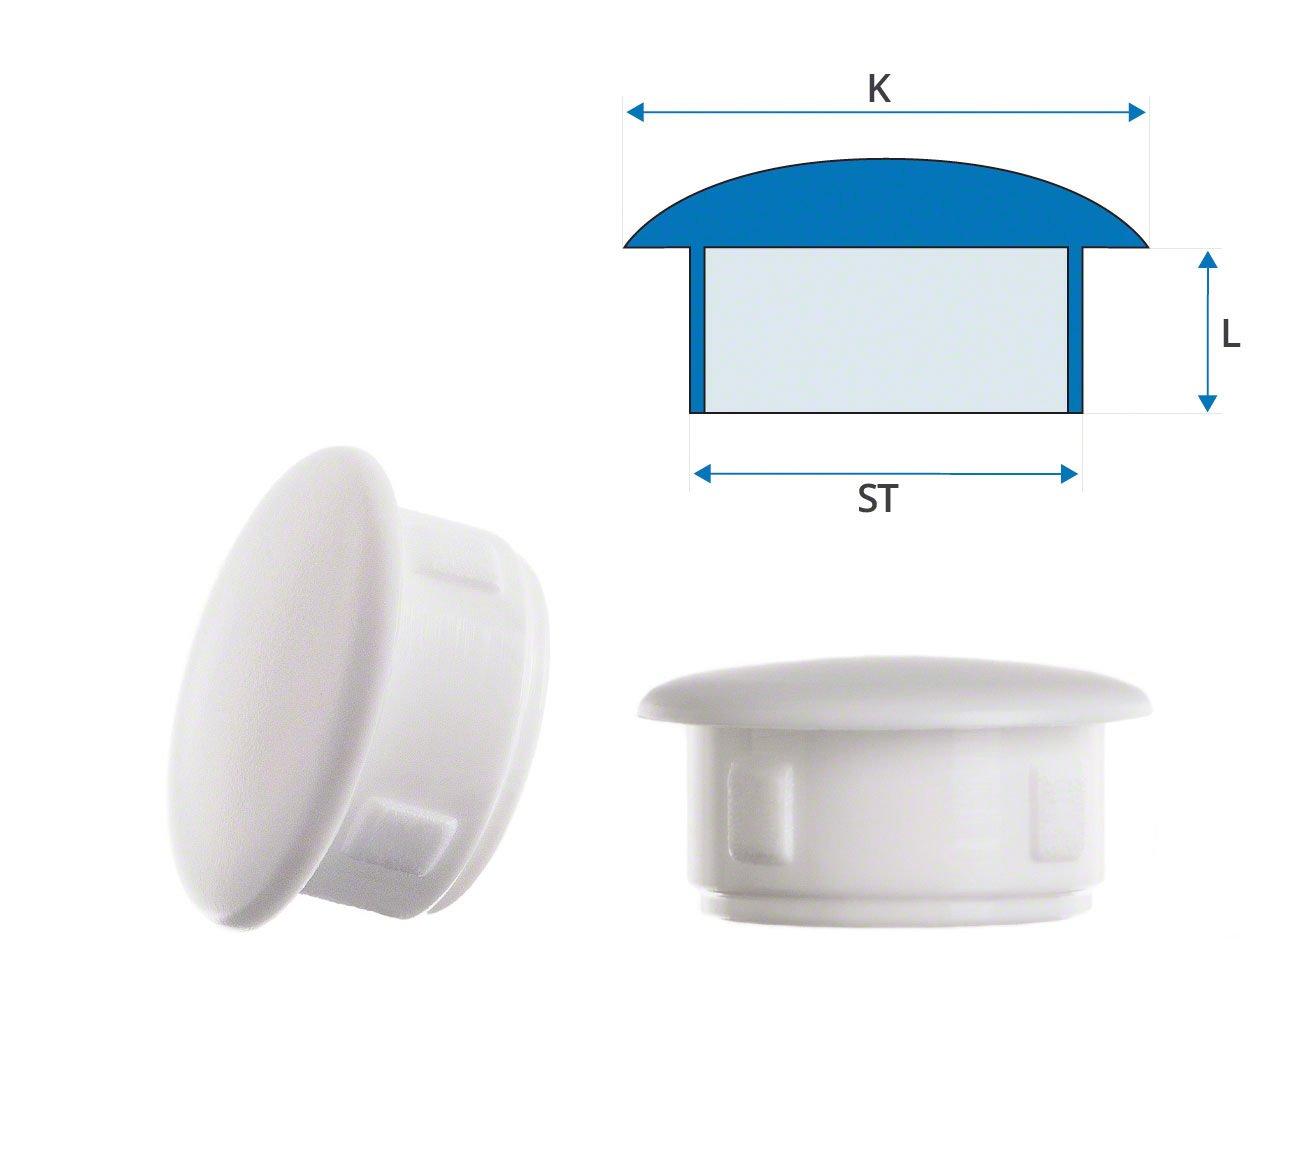 Abdeckstopfen 30x25 mm Wei/ß Abdeckkappen Blindstopfen Kunststoffkappen 10 Stck